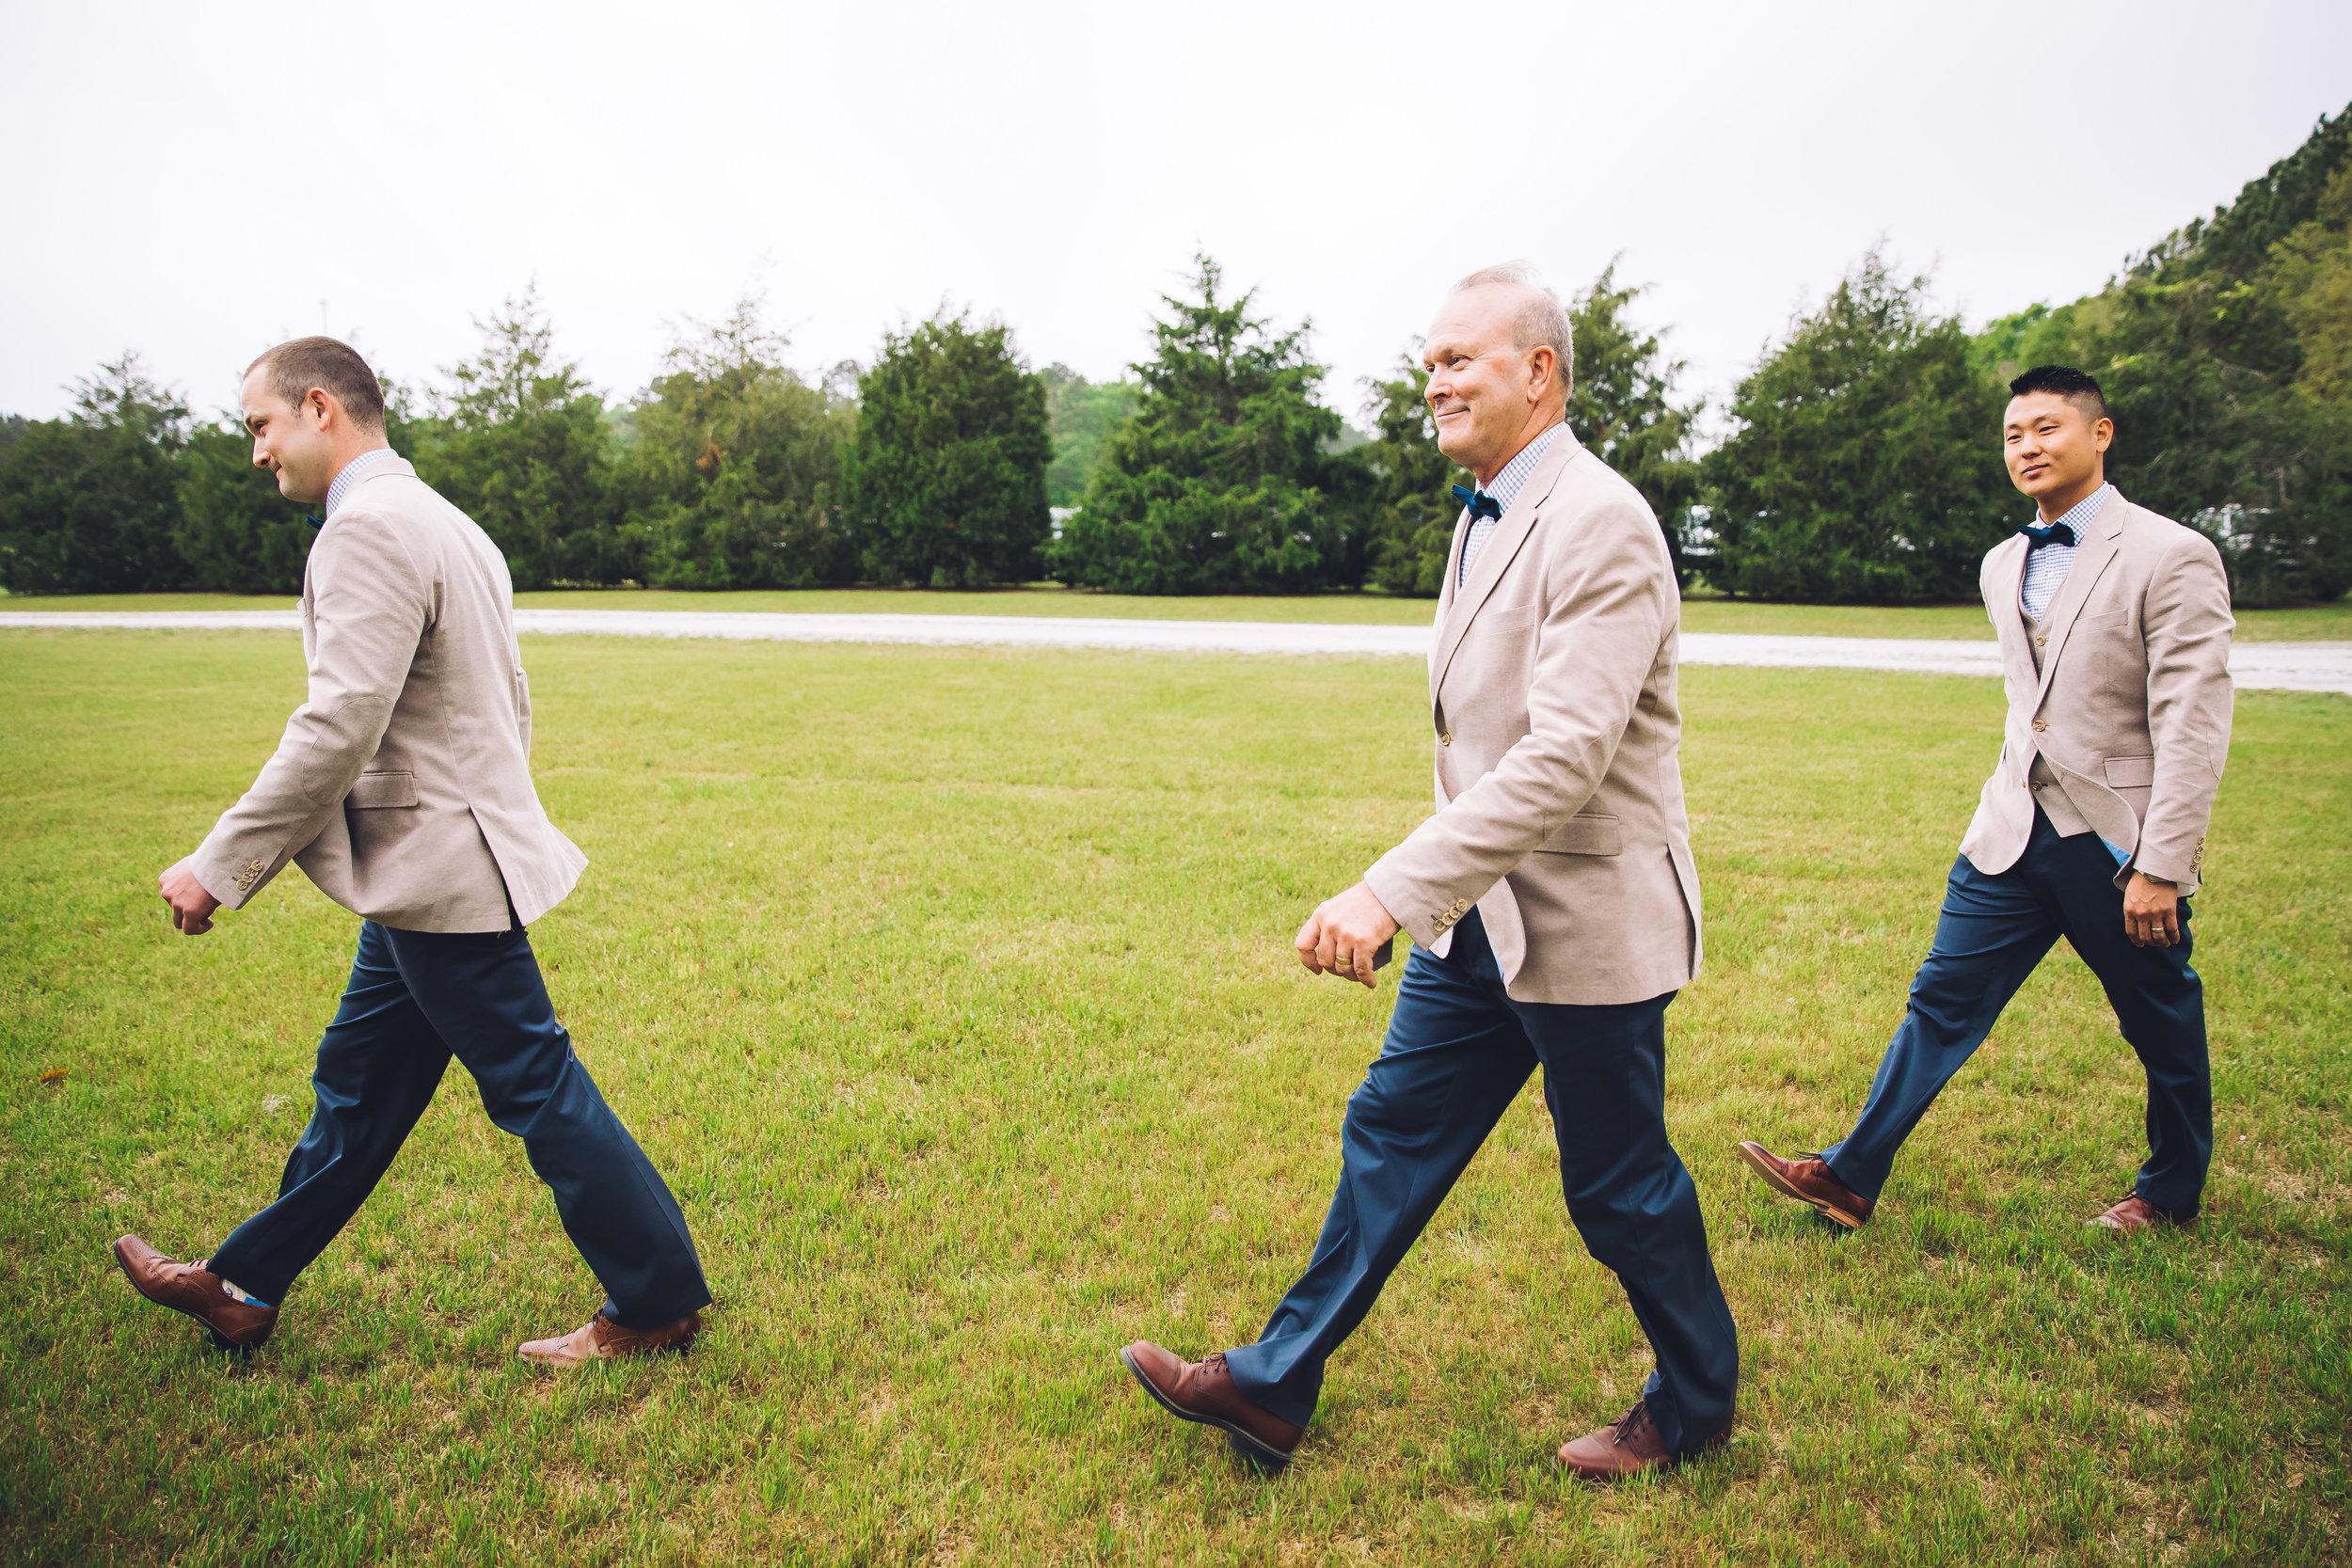 charleston groomsmen